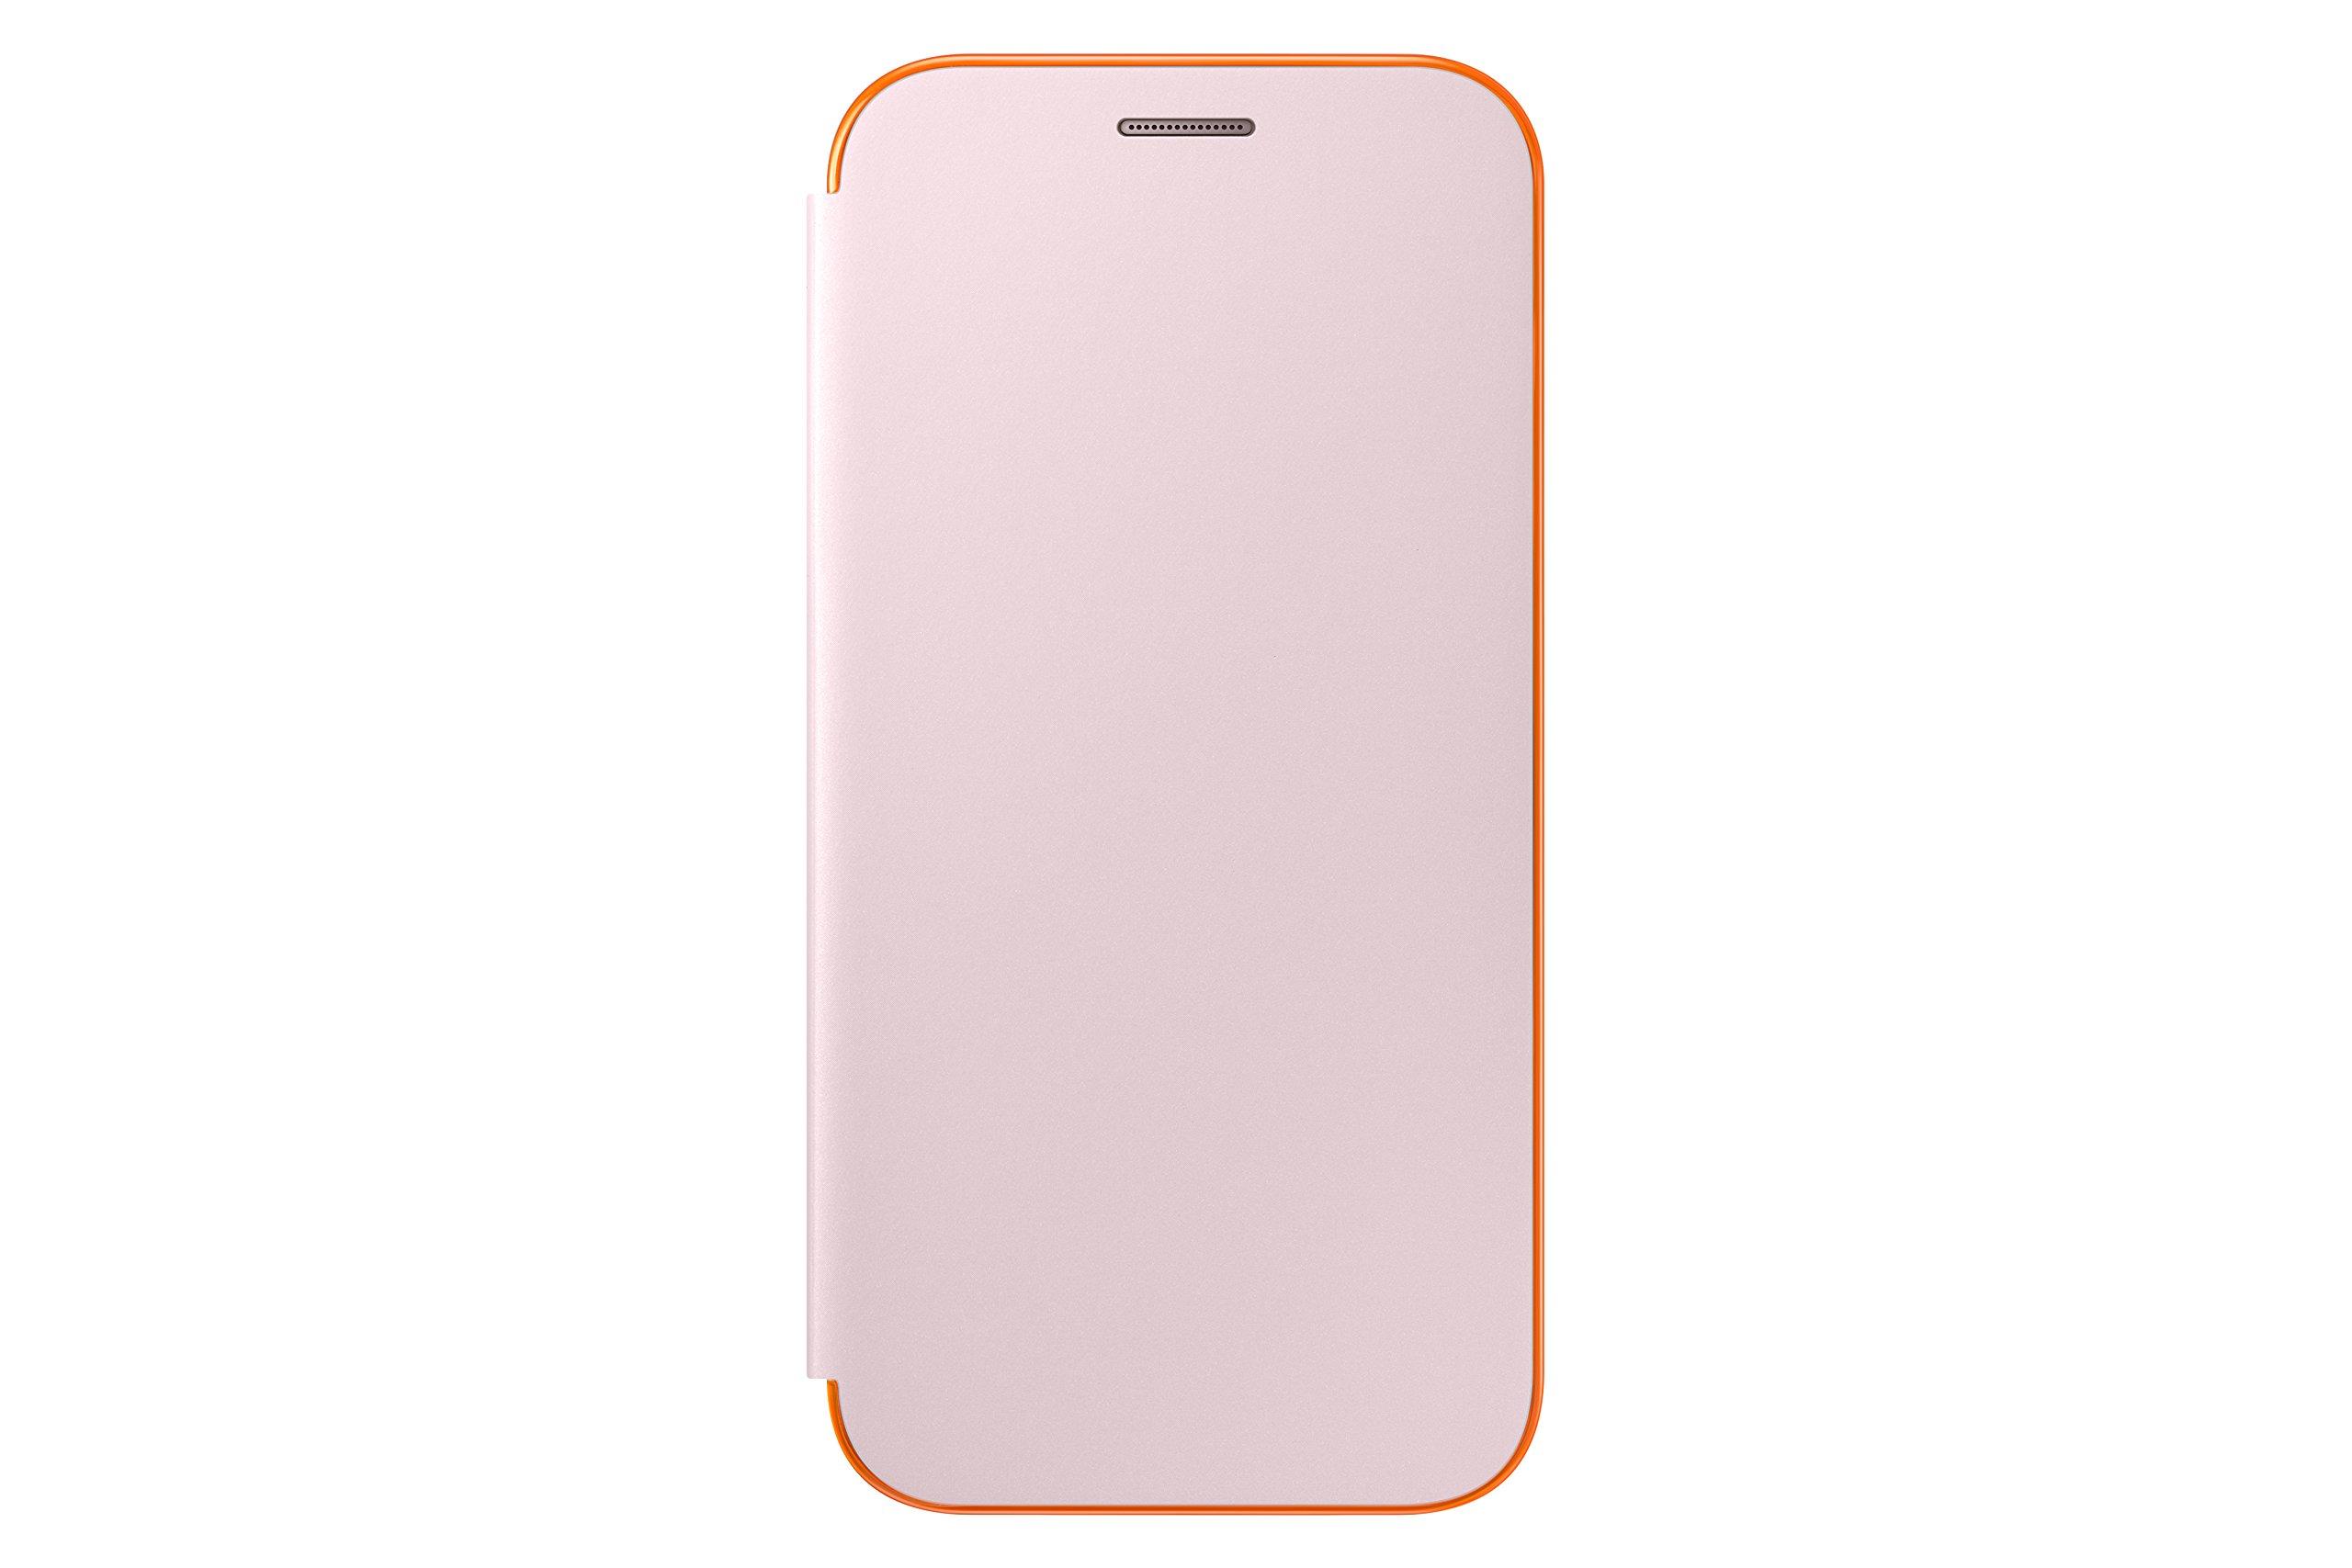 Samsung A5 2017 Neon Flip Cover pink, EF-FA520PPEGWW